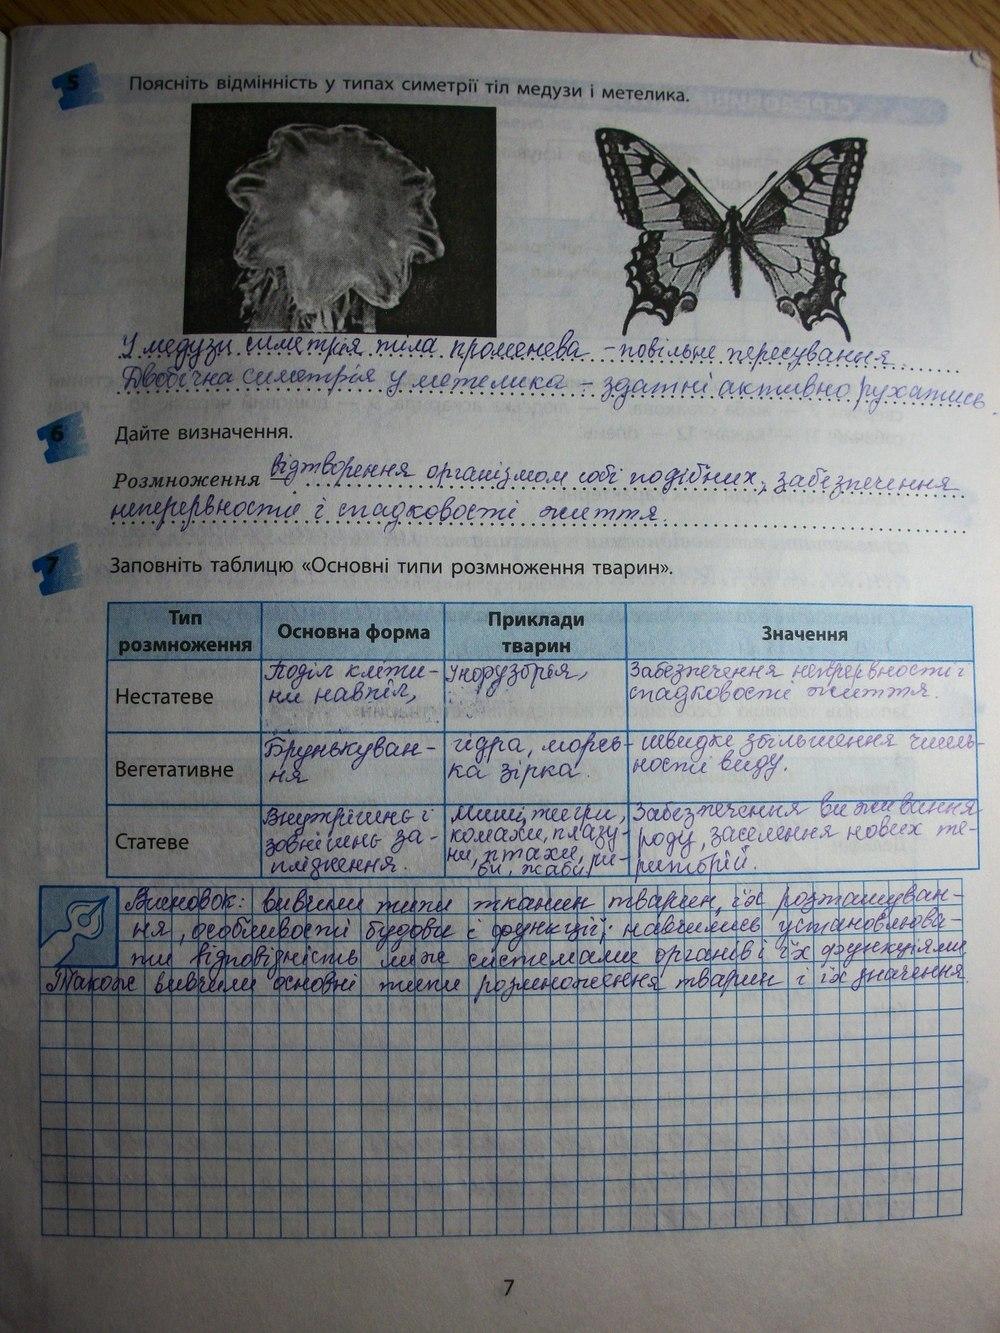 гдз по биология 8 клас до друк зошита котык таглина